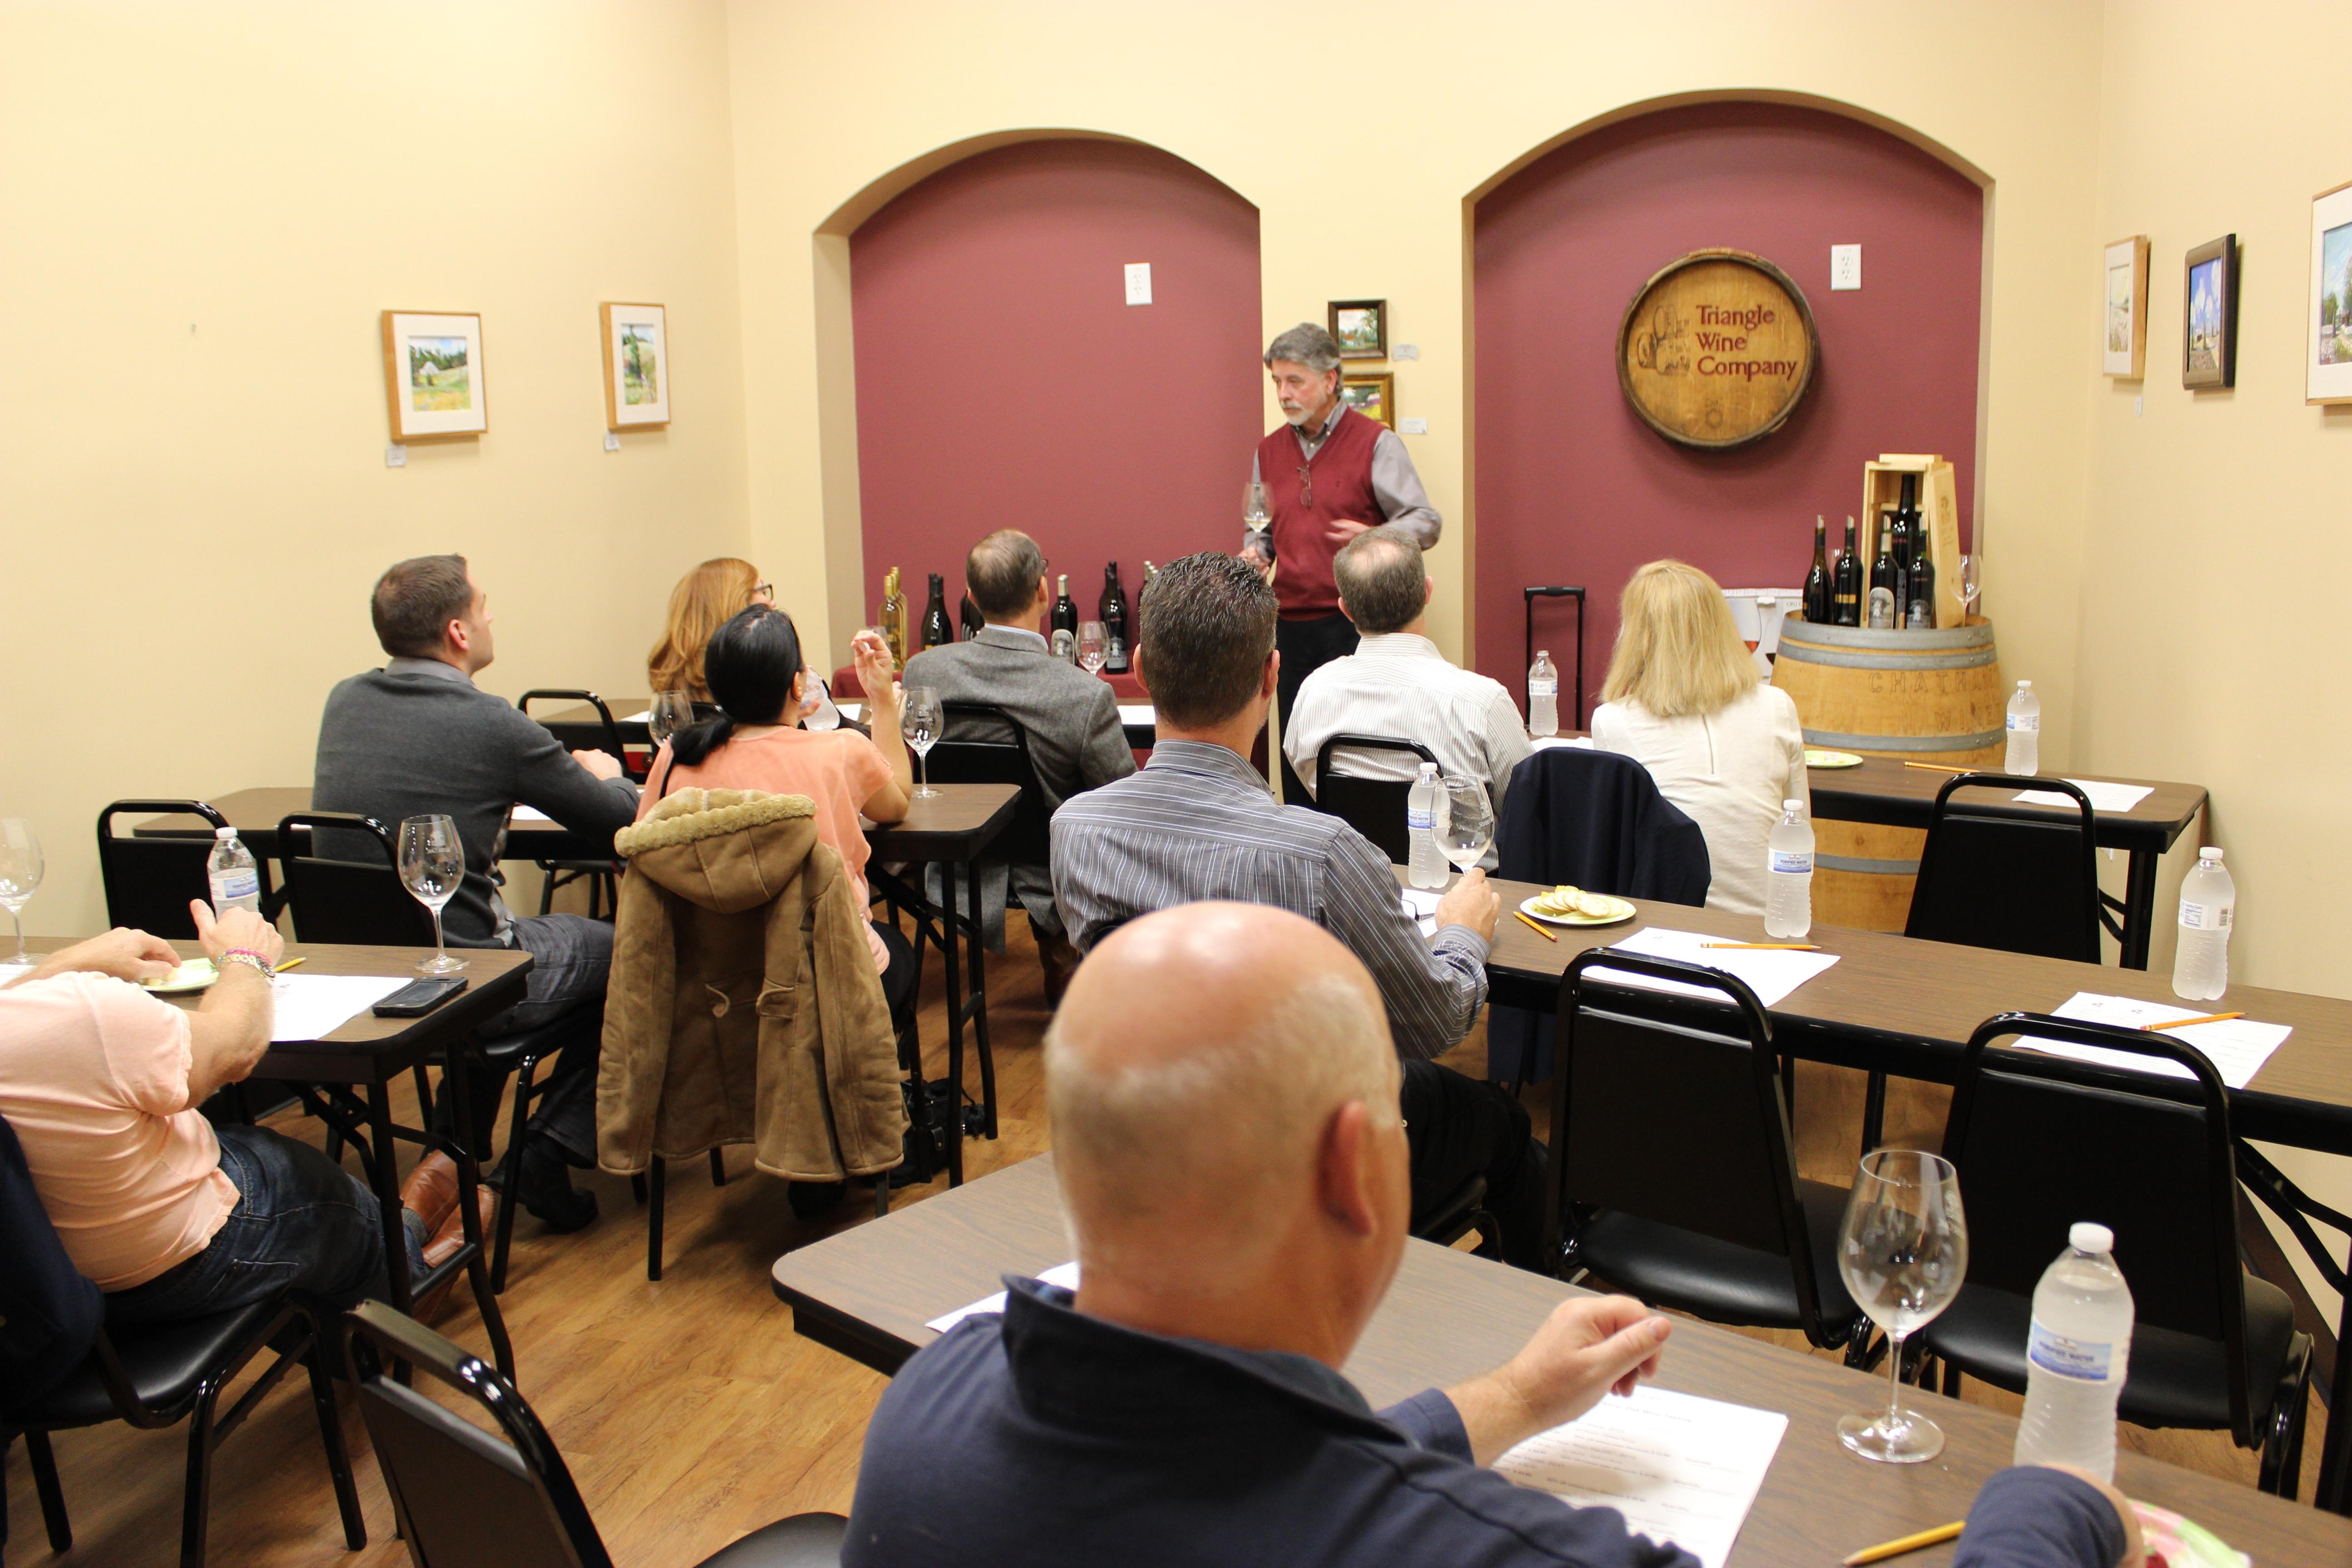 Triangle Wine Co. Cary Wine Tasting Class Room